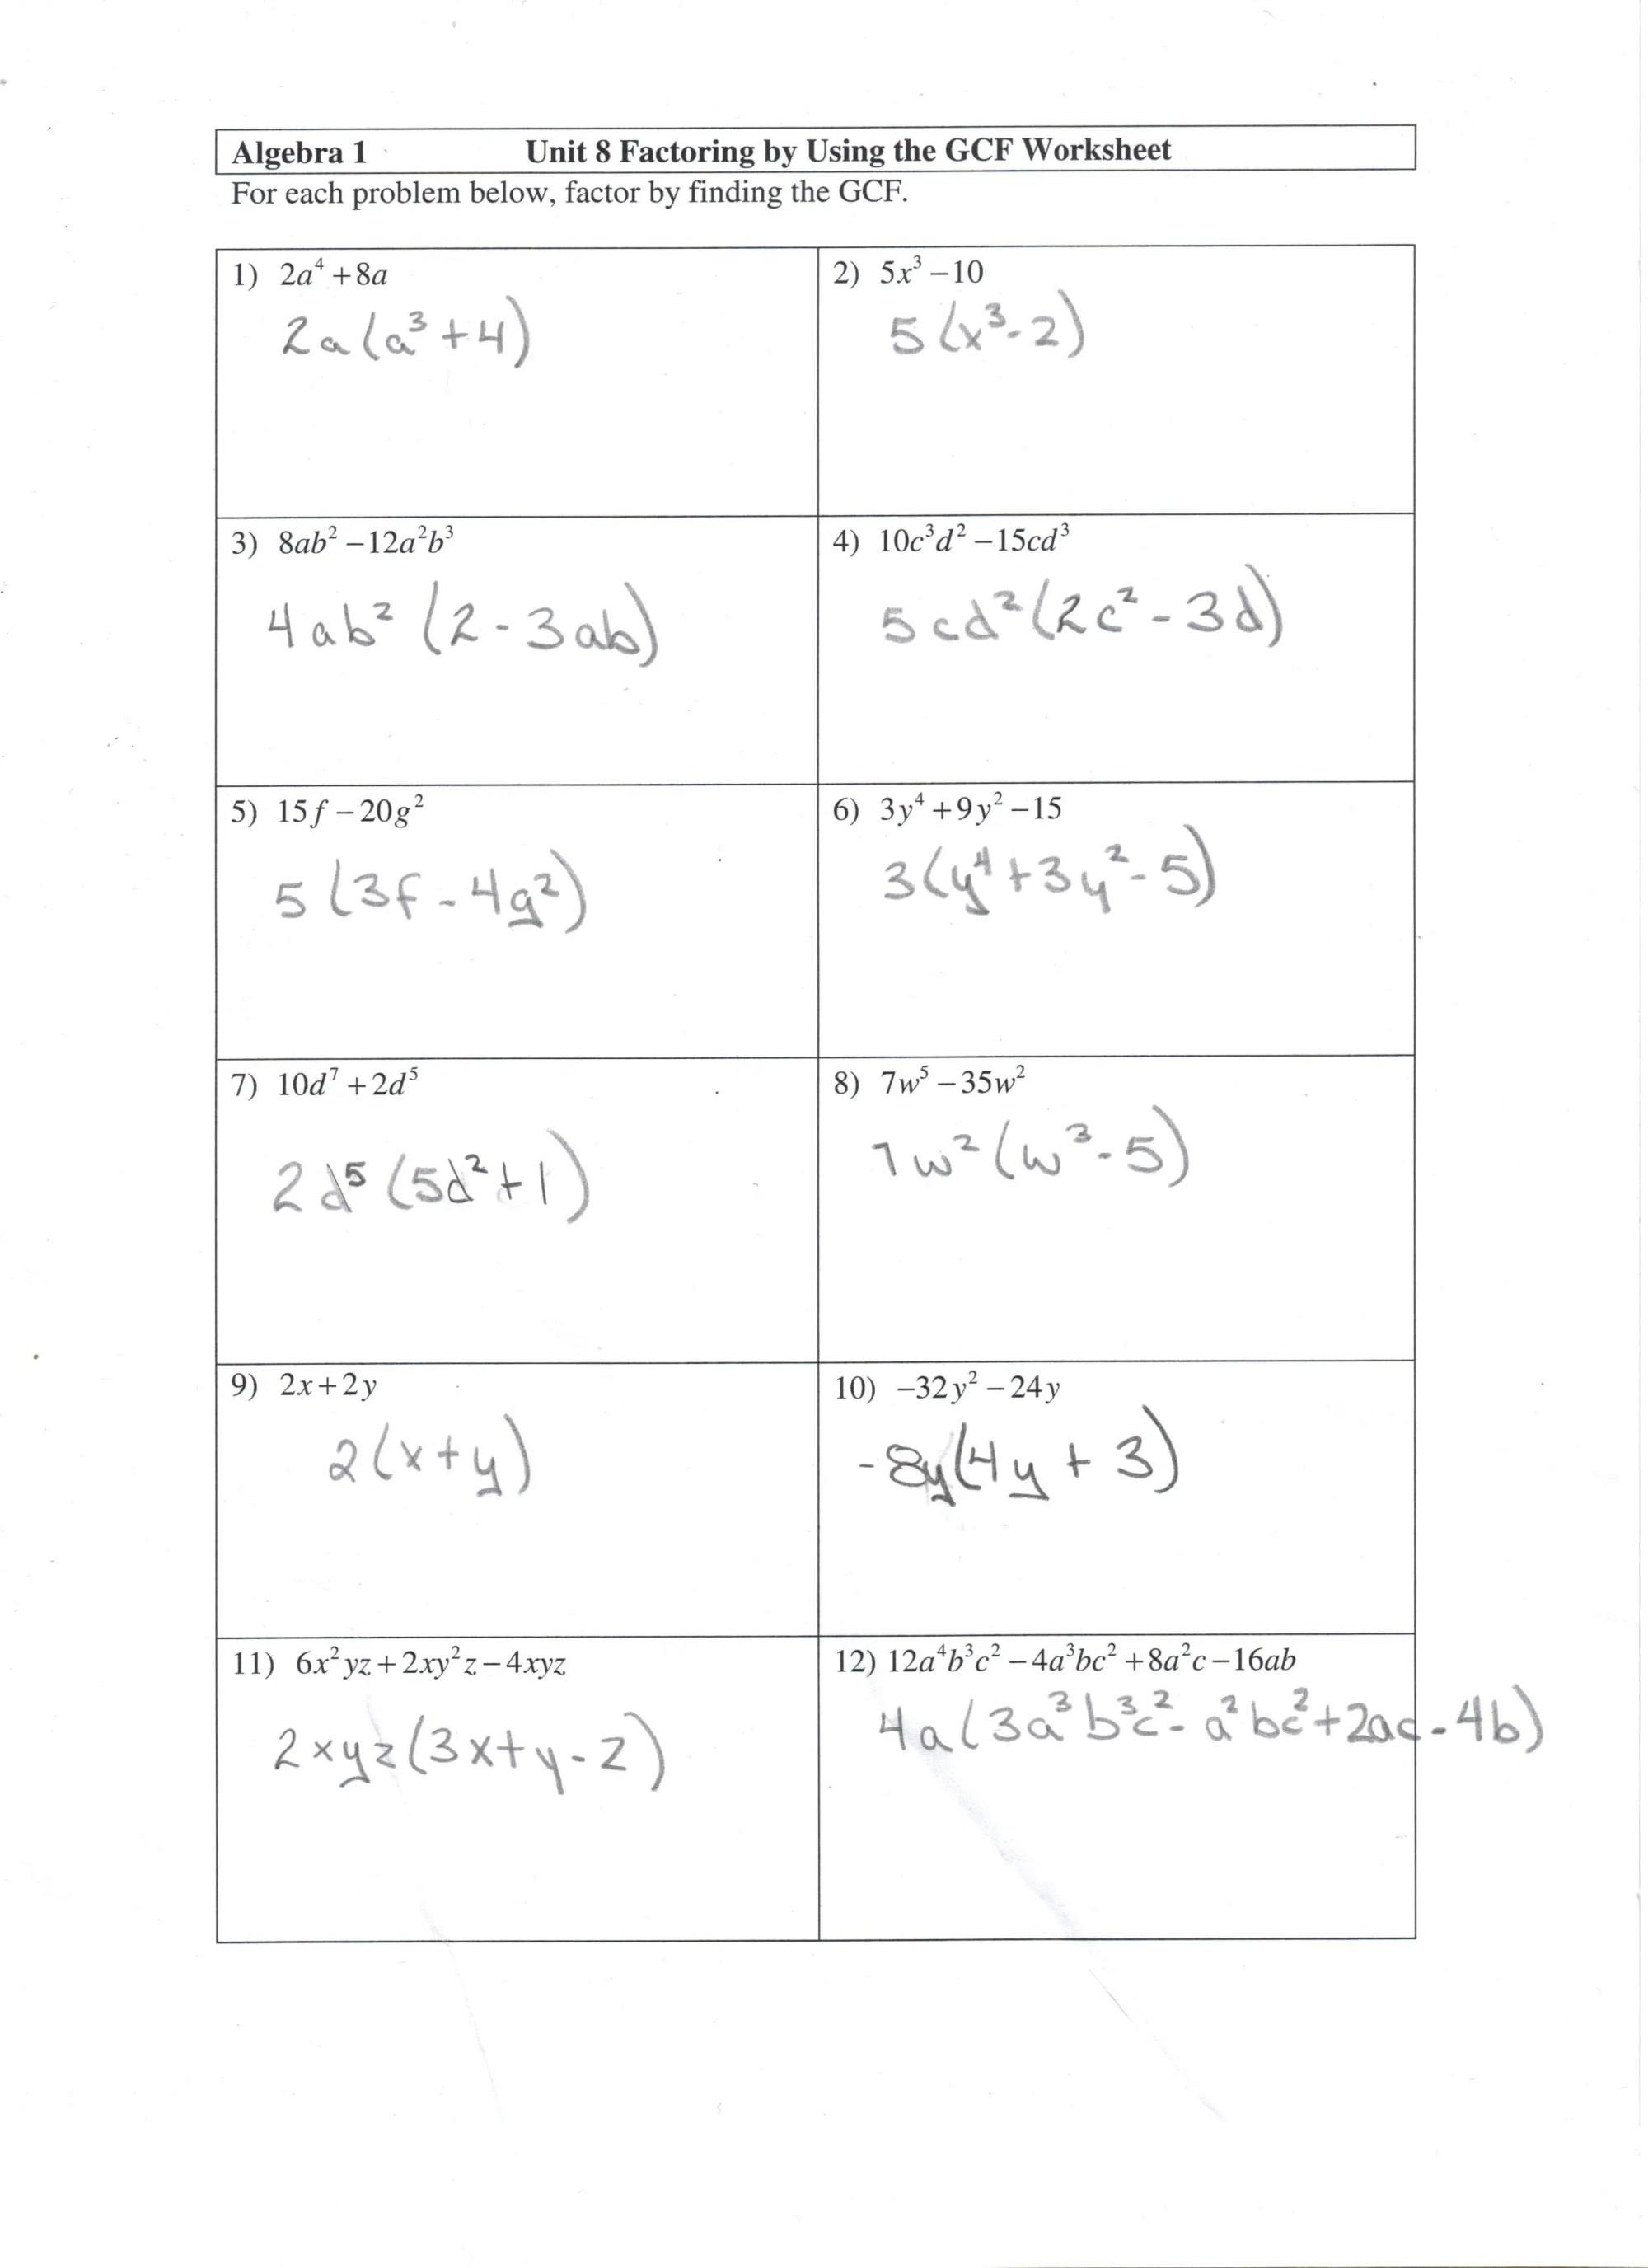 hight resolution of 27 Algebra 1 Unit 8 Factoring By Using The Gcf Worksheet - Free Worksheet  Spreadsheet